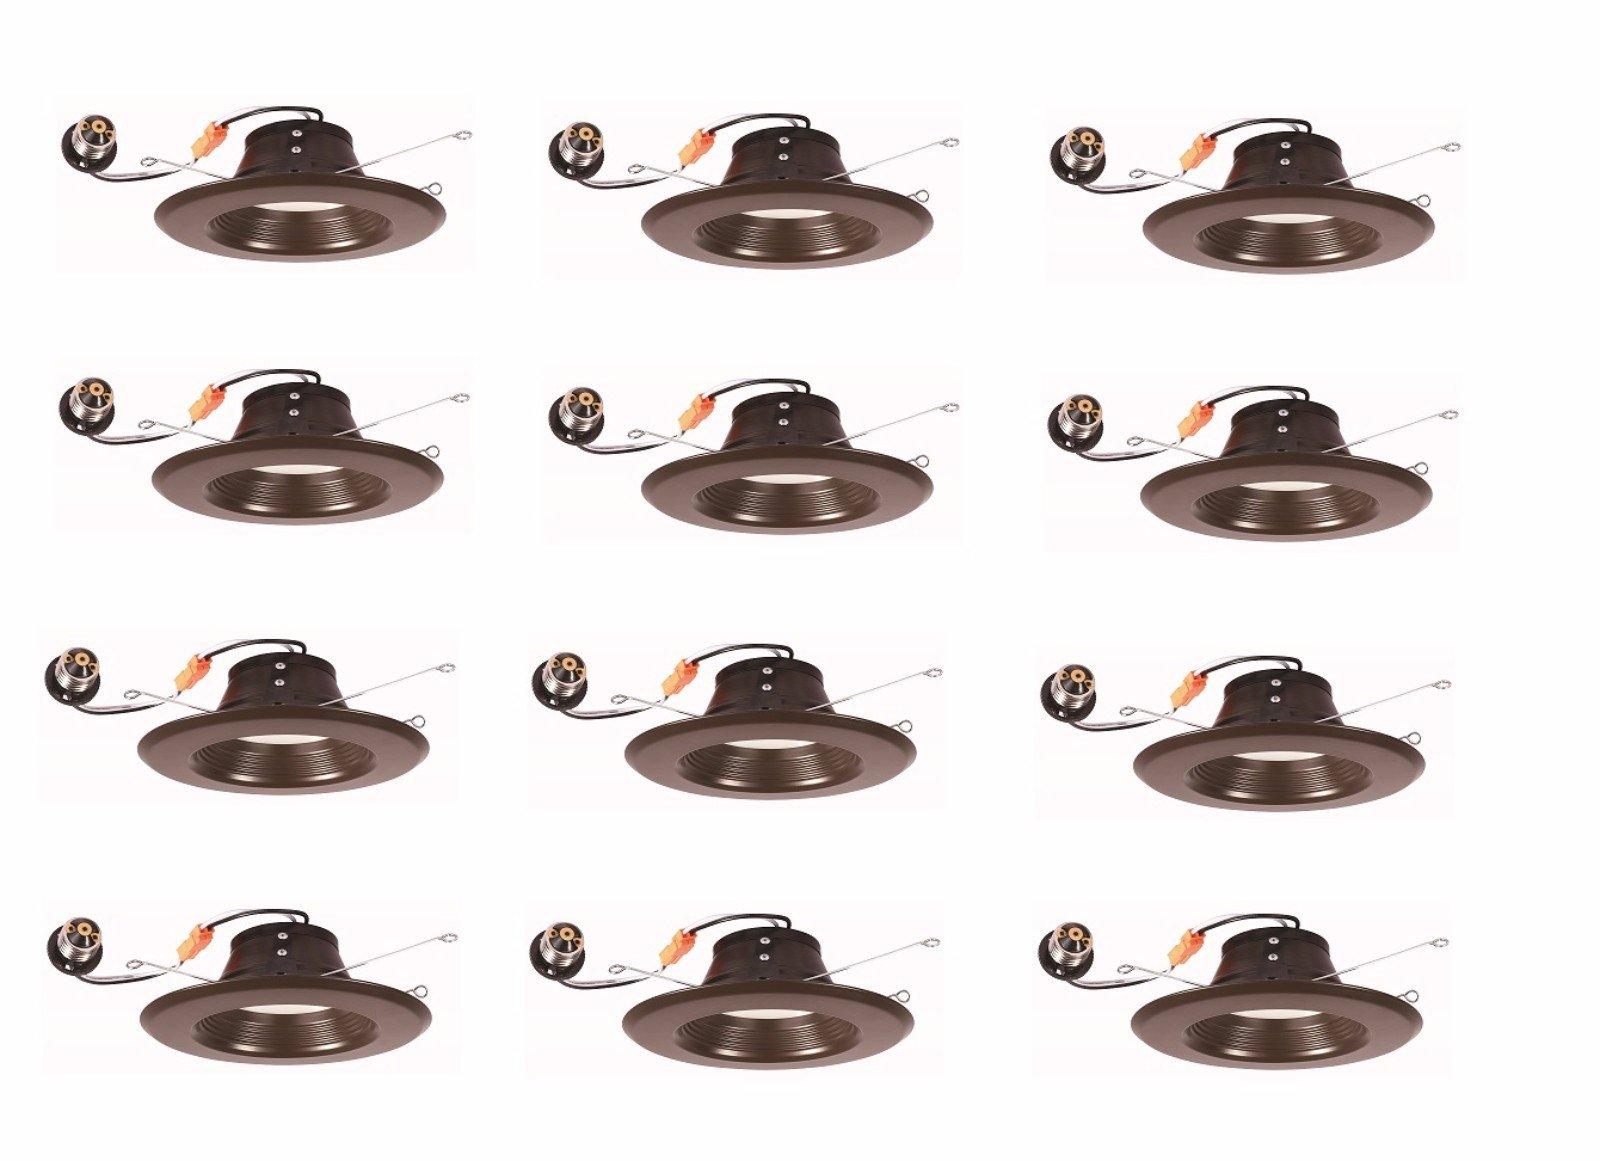 Elitco Lighting R41330KBZ-12PK LED-Household-Light-Bulbs 4'' Retrofit, 3000K, 120°, CRI90, ES, Etl, 13W, 65W Equivalent, 50000HRS, LM800, Dimmable, 5 Years Warranty, Input Voltage 120V, Bronze 12 Pack